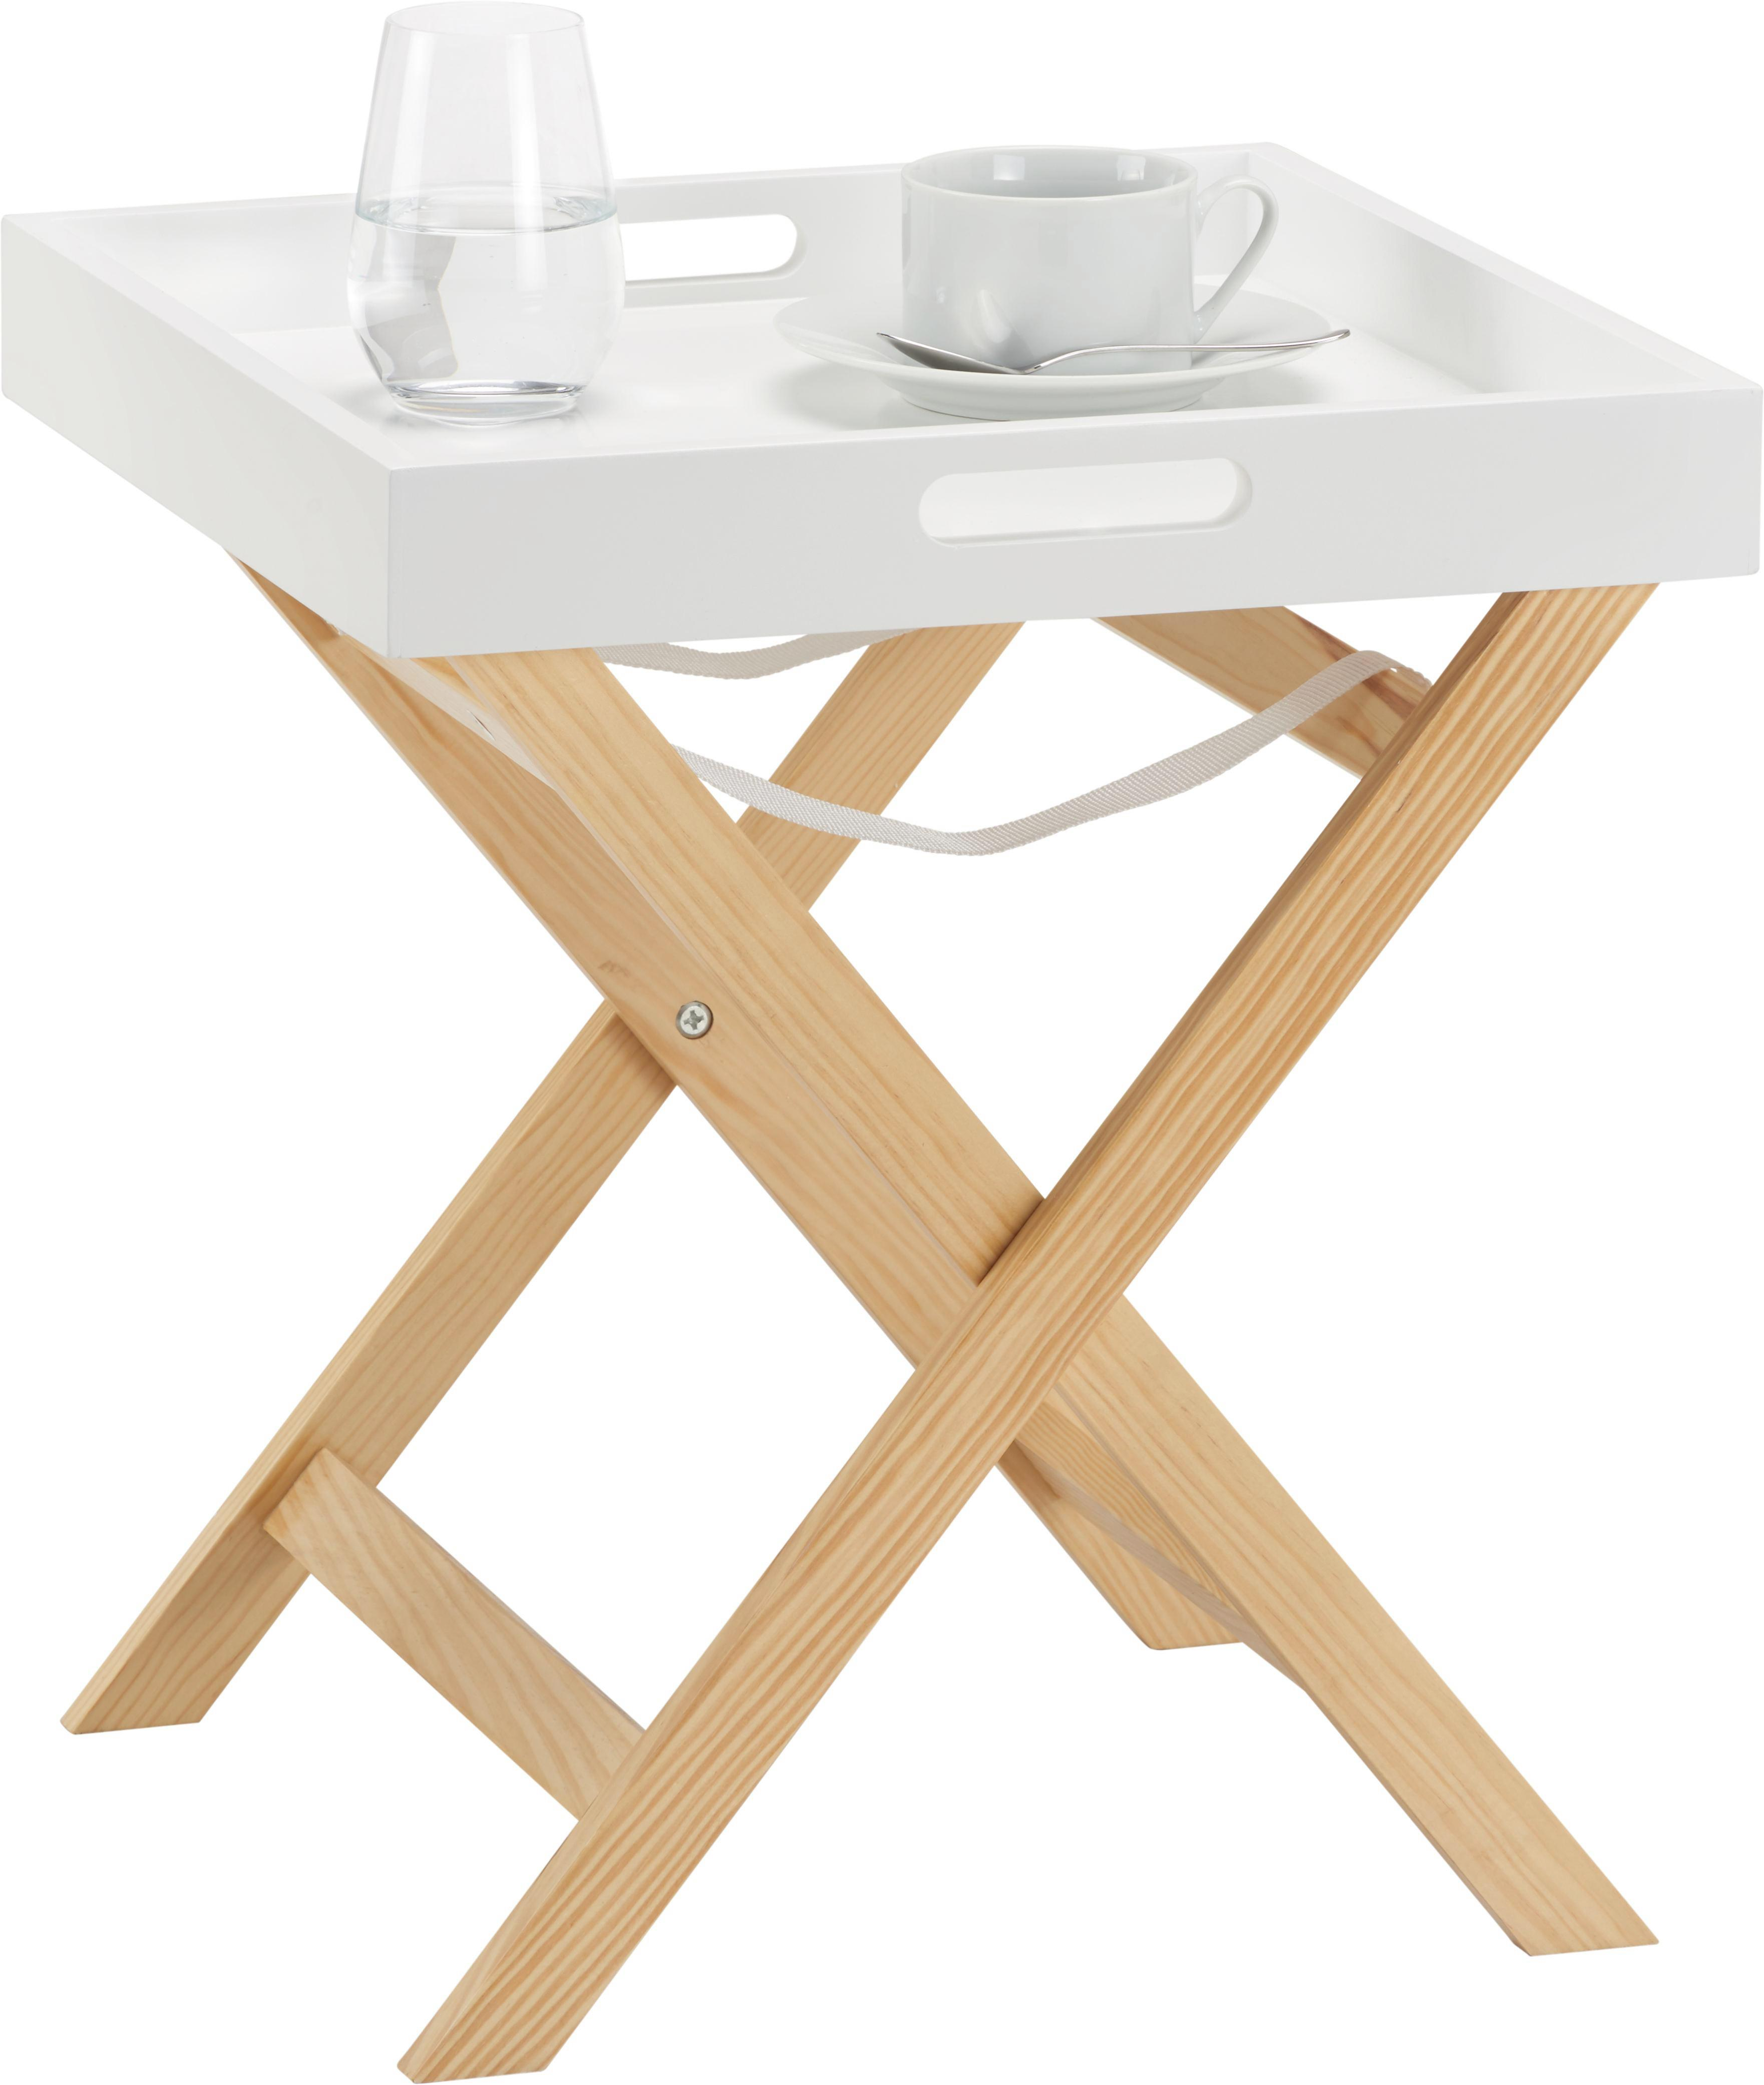 Beistelltisch Niels 40x40cm - Braun/Weiß, MODERN, Holz (40/46/40cm) - MÖMAX modern living